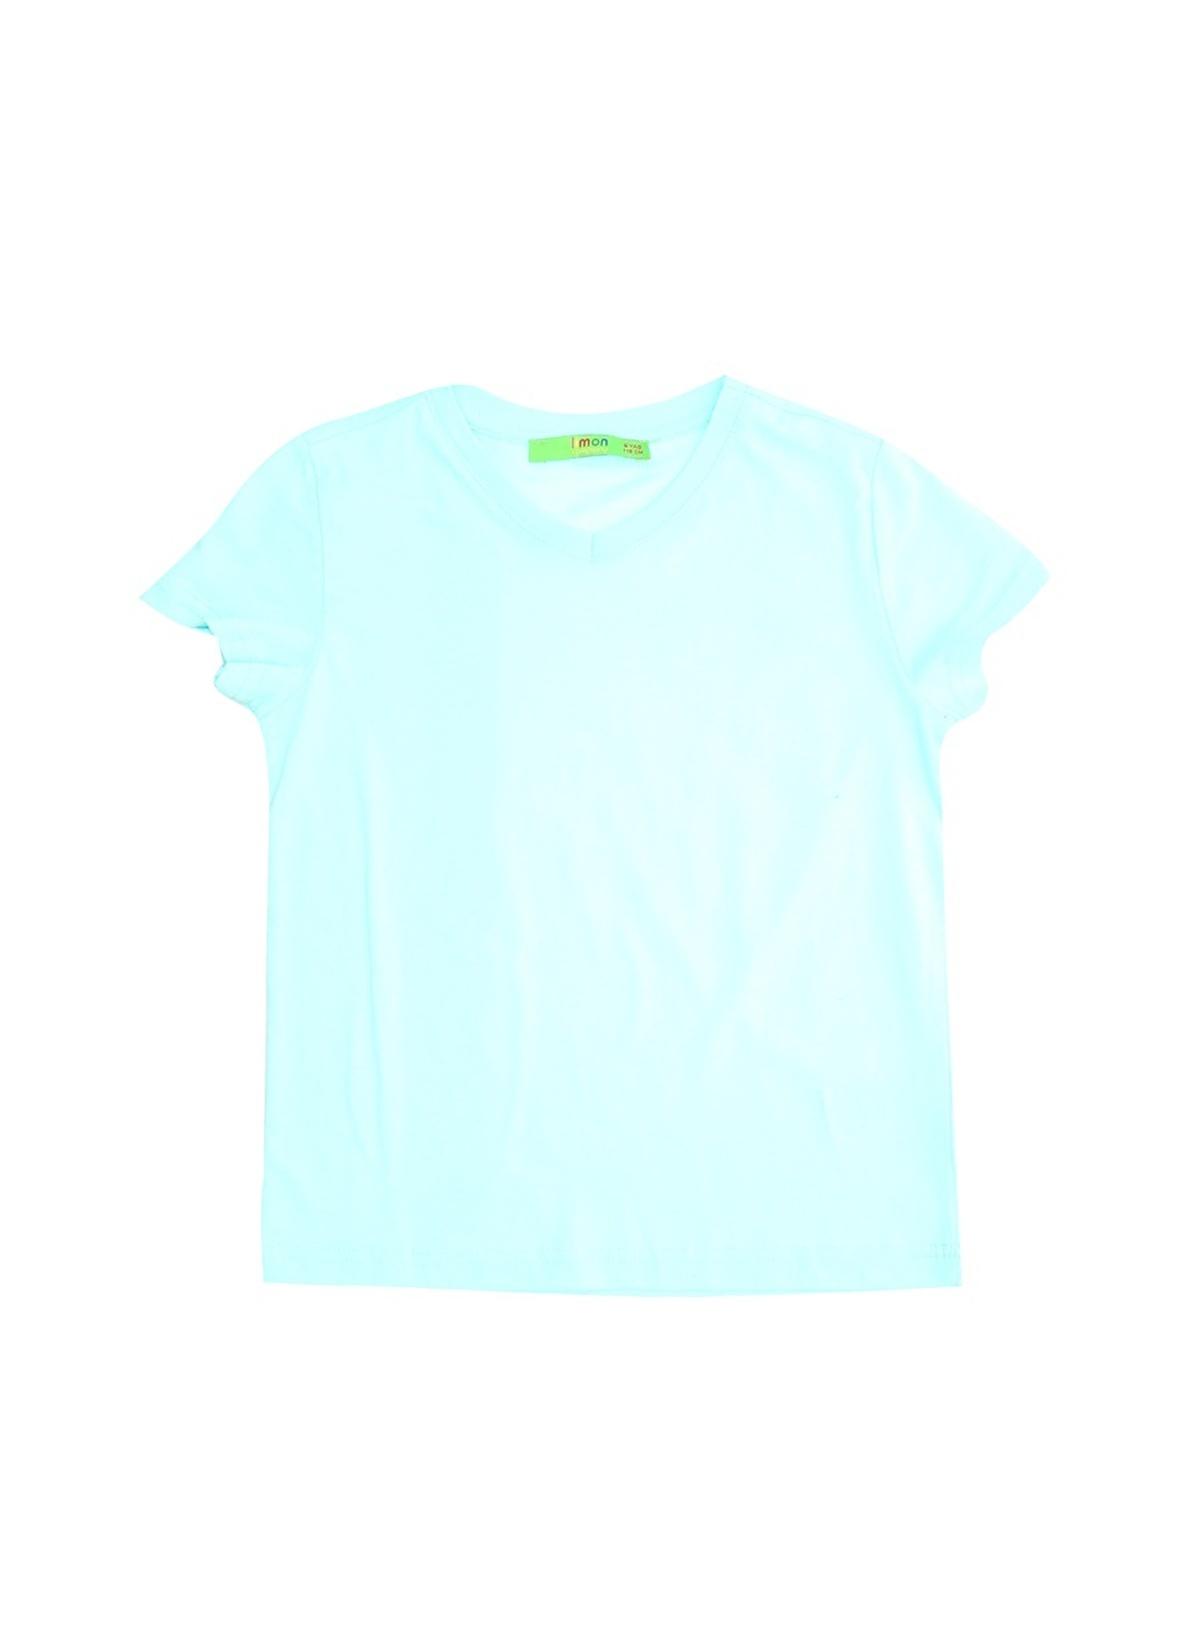 Limon Company Sweatshirt 71ısk K-folderboy Eee Trkz – 17.99 TL